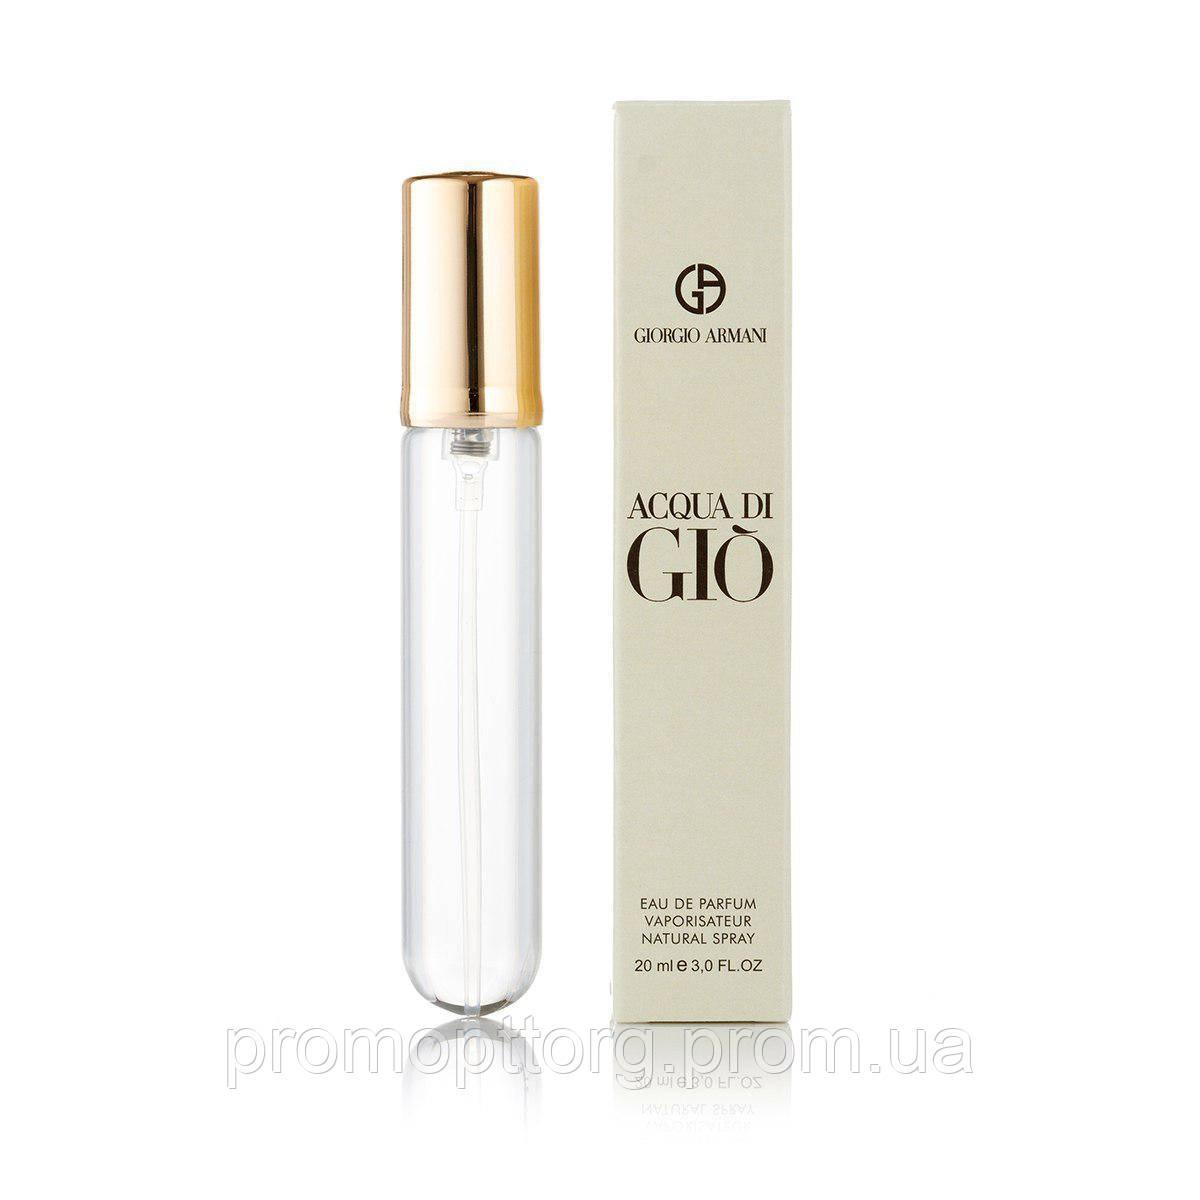 Мужской мини парфюм Armani Acqua di Gio pour homme 20 ml  (реплика)